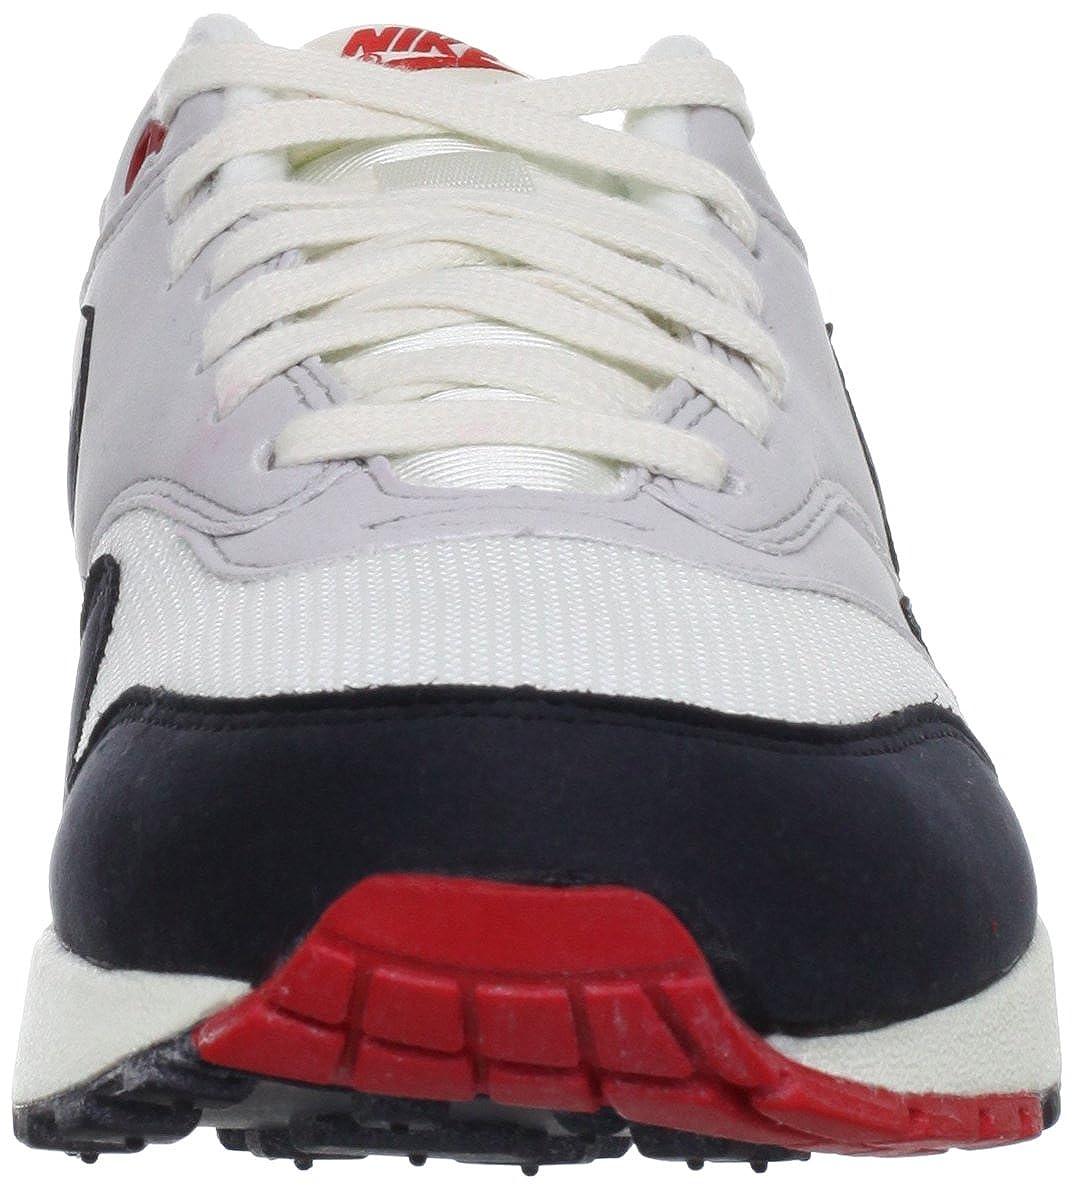 size 40 71803 3f857 Nike Air Max 1 Og Sail neutral  university  dark Obsidian 554717-100   Amazon.co.uk  Shoes   Bags